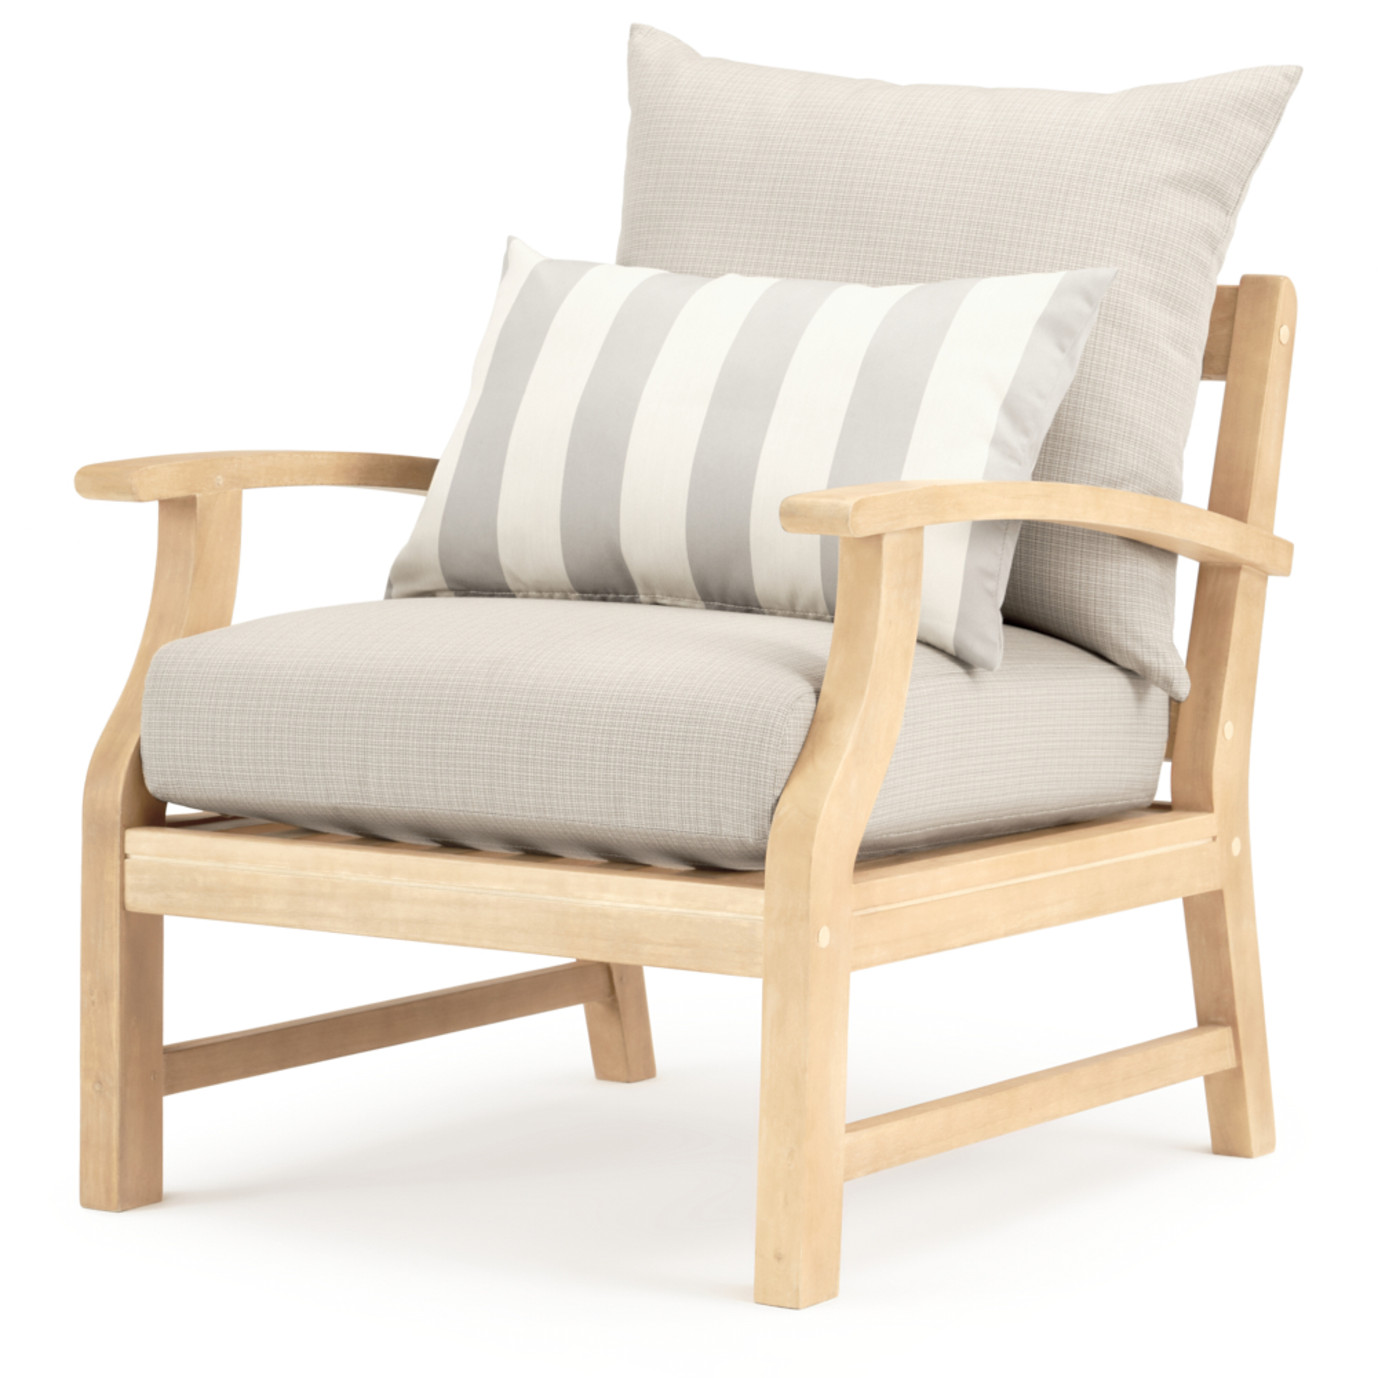 Kooper 4pc Outdoor Sofa & Club Chair Set - Slate Gray